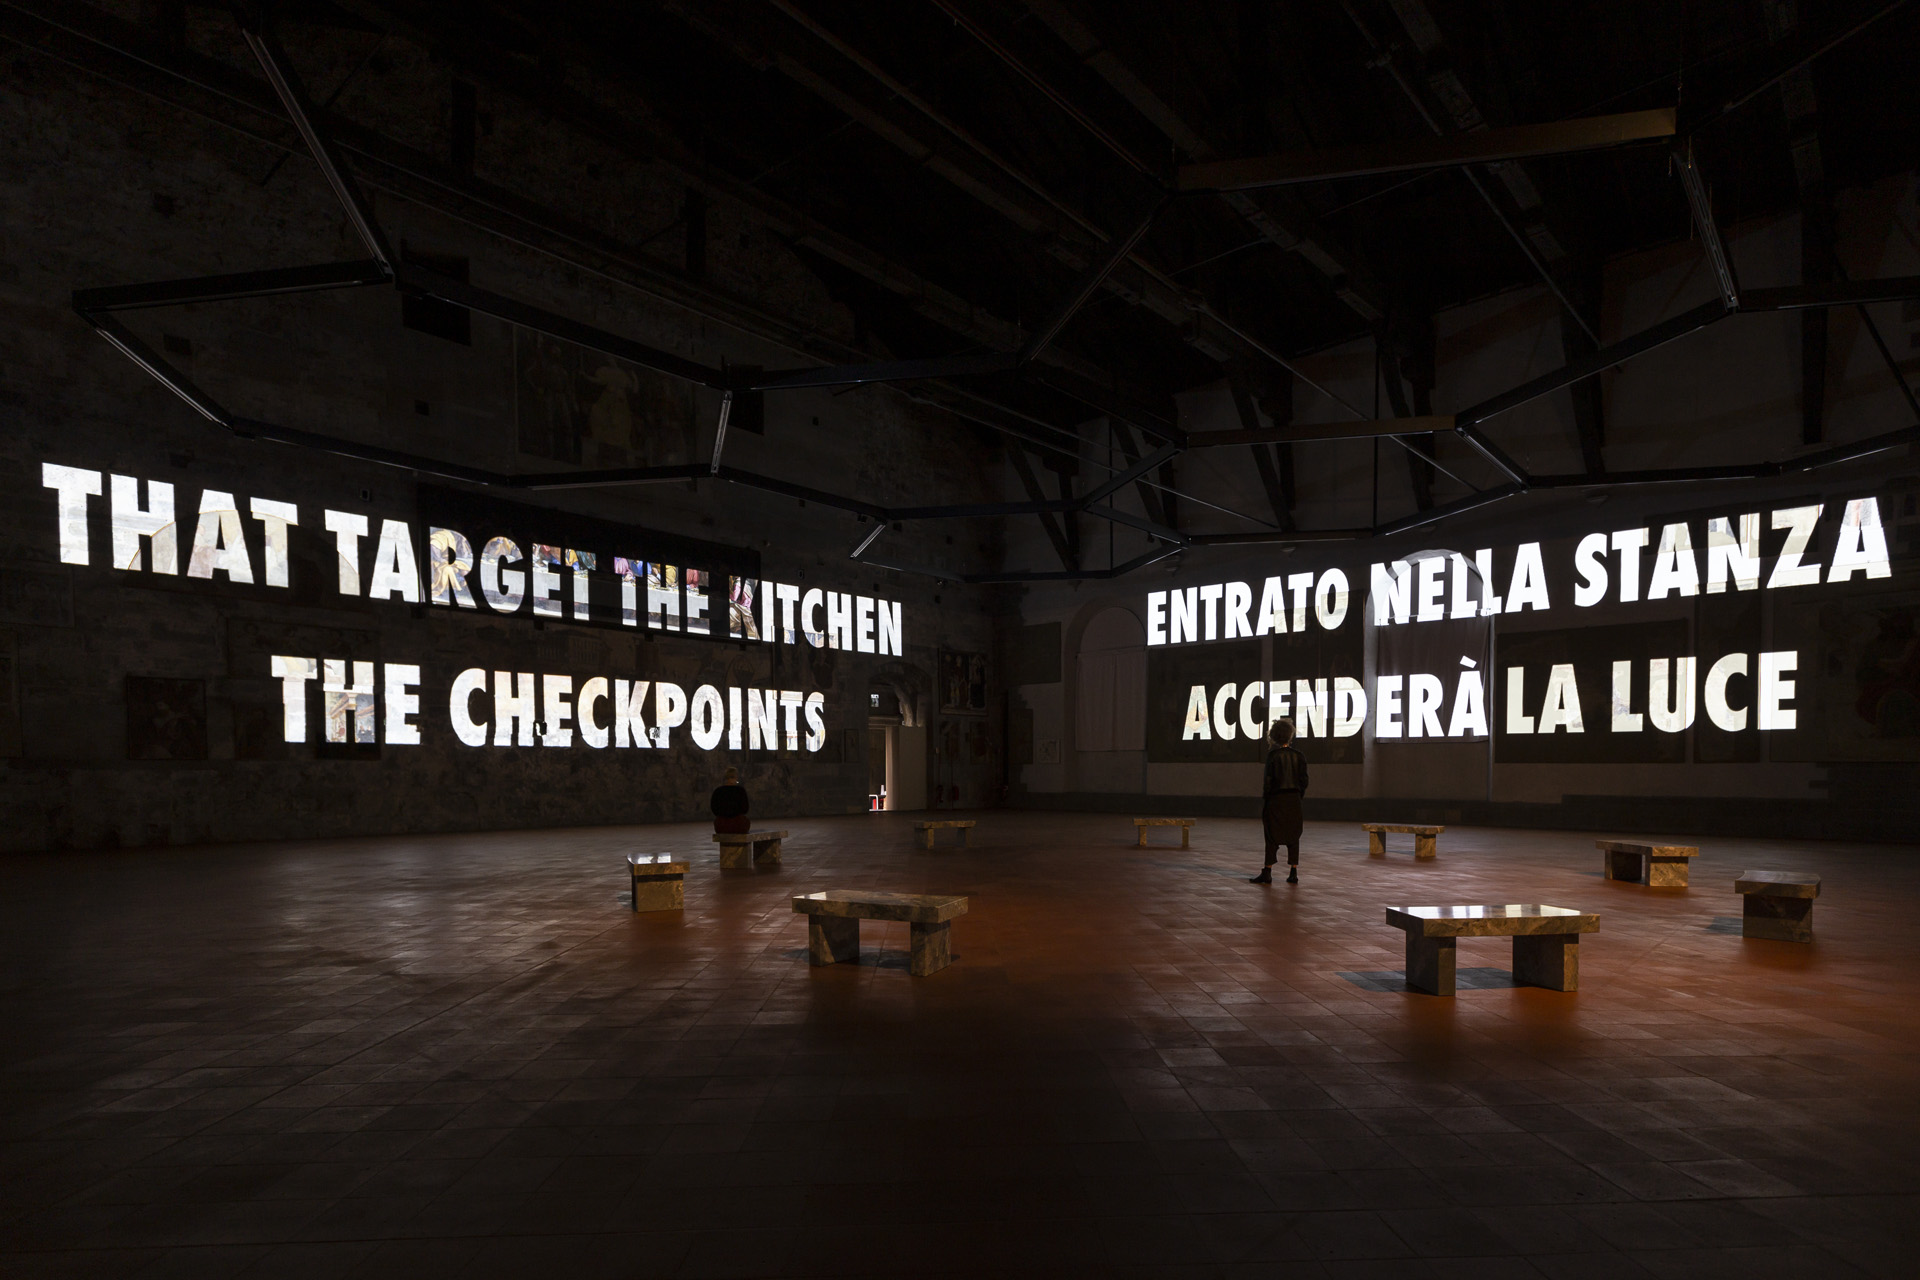 Tutta la Verità (The Whole Truth), GAMeC, Palazzo della Ragione, Bergamo, Italy, 2019 © 2019 Jenny Holzer, member Artists Rights Society (ARS), NY